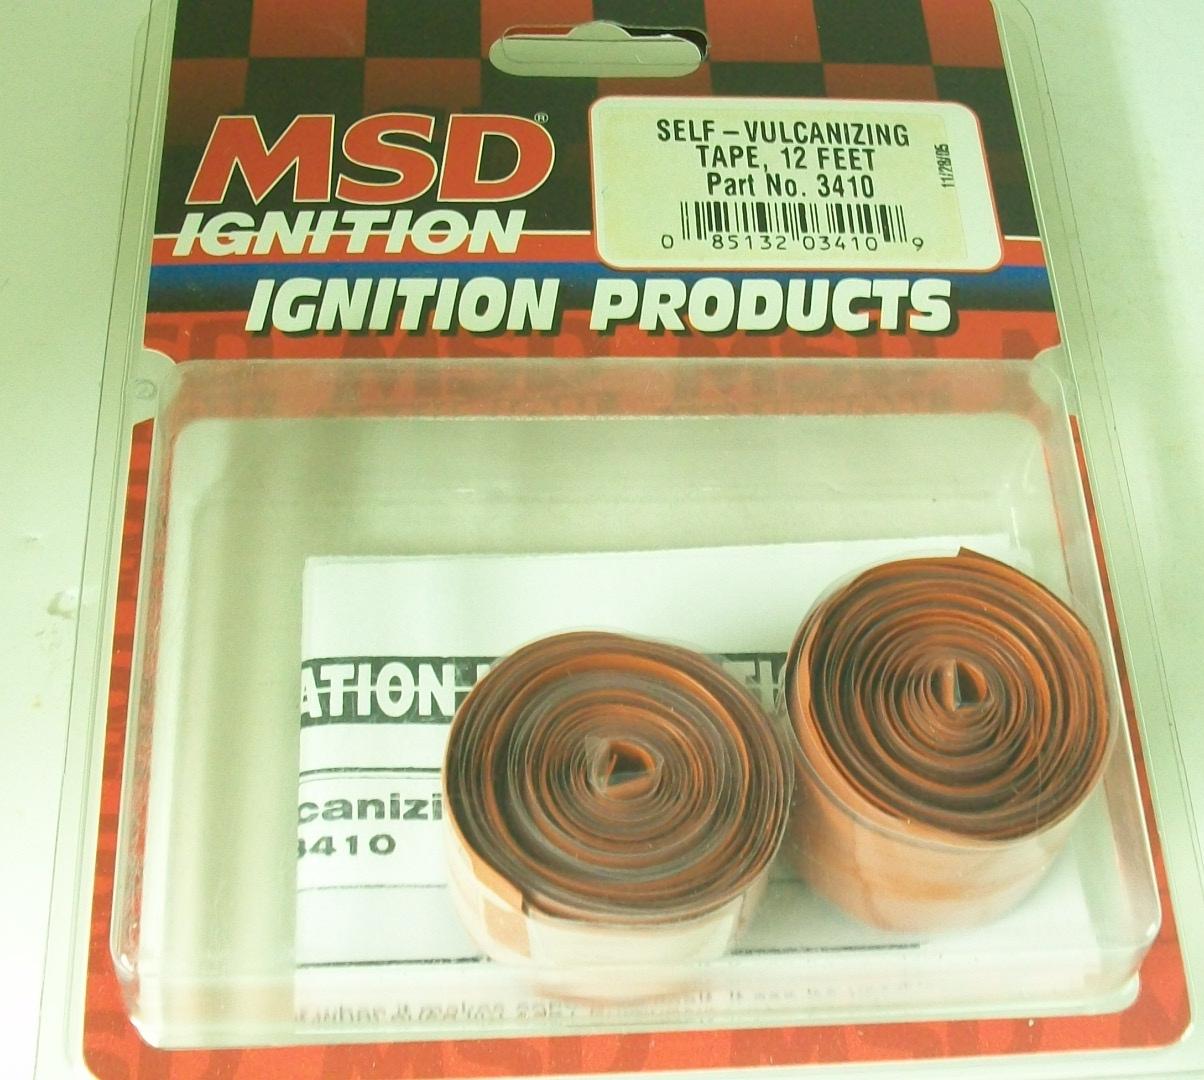 MSD Ignition 3410 Self Vulcanizing Tape